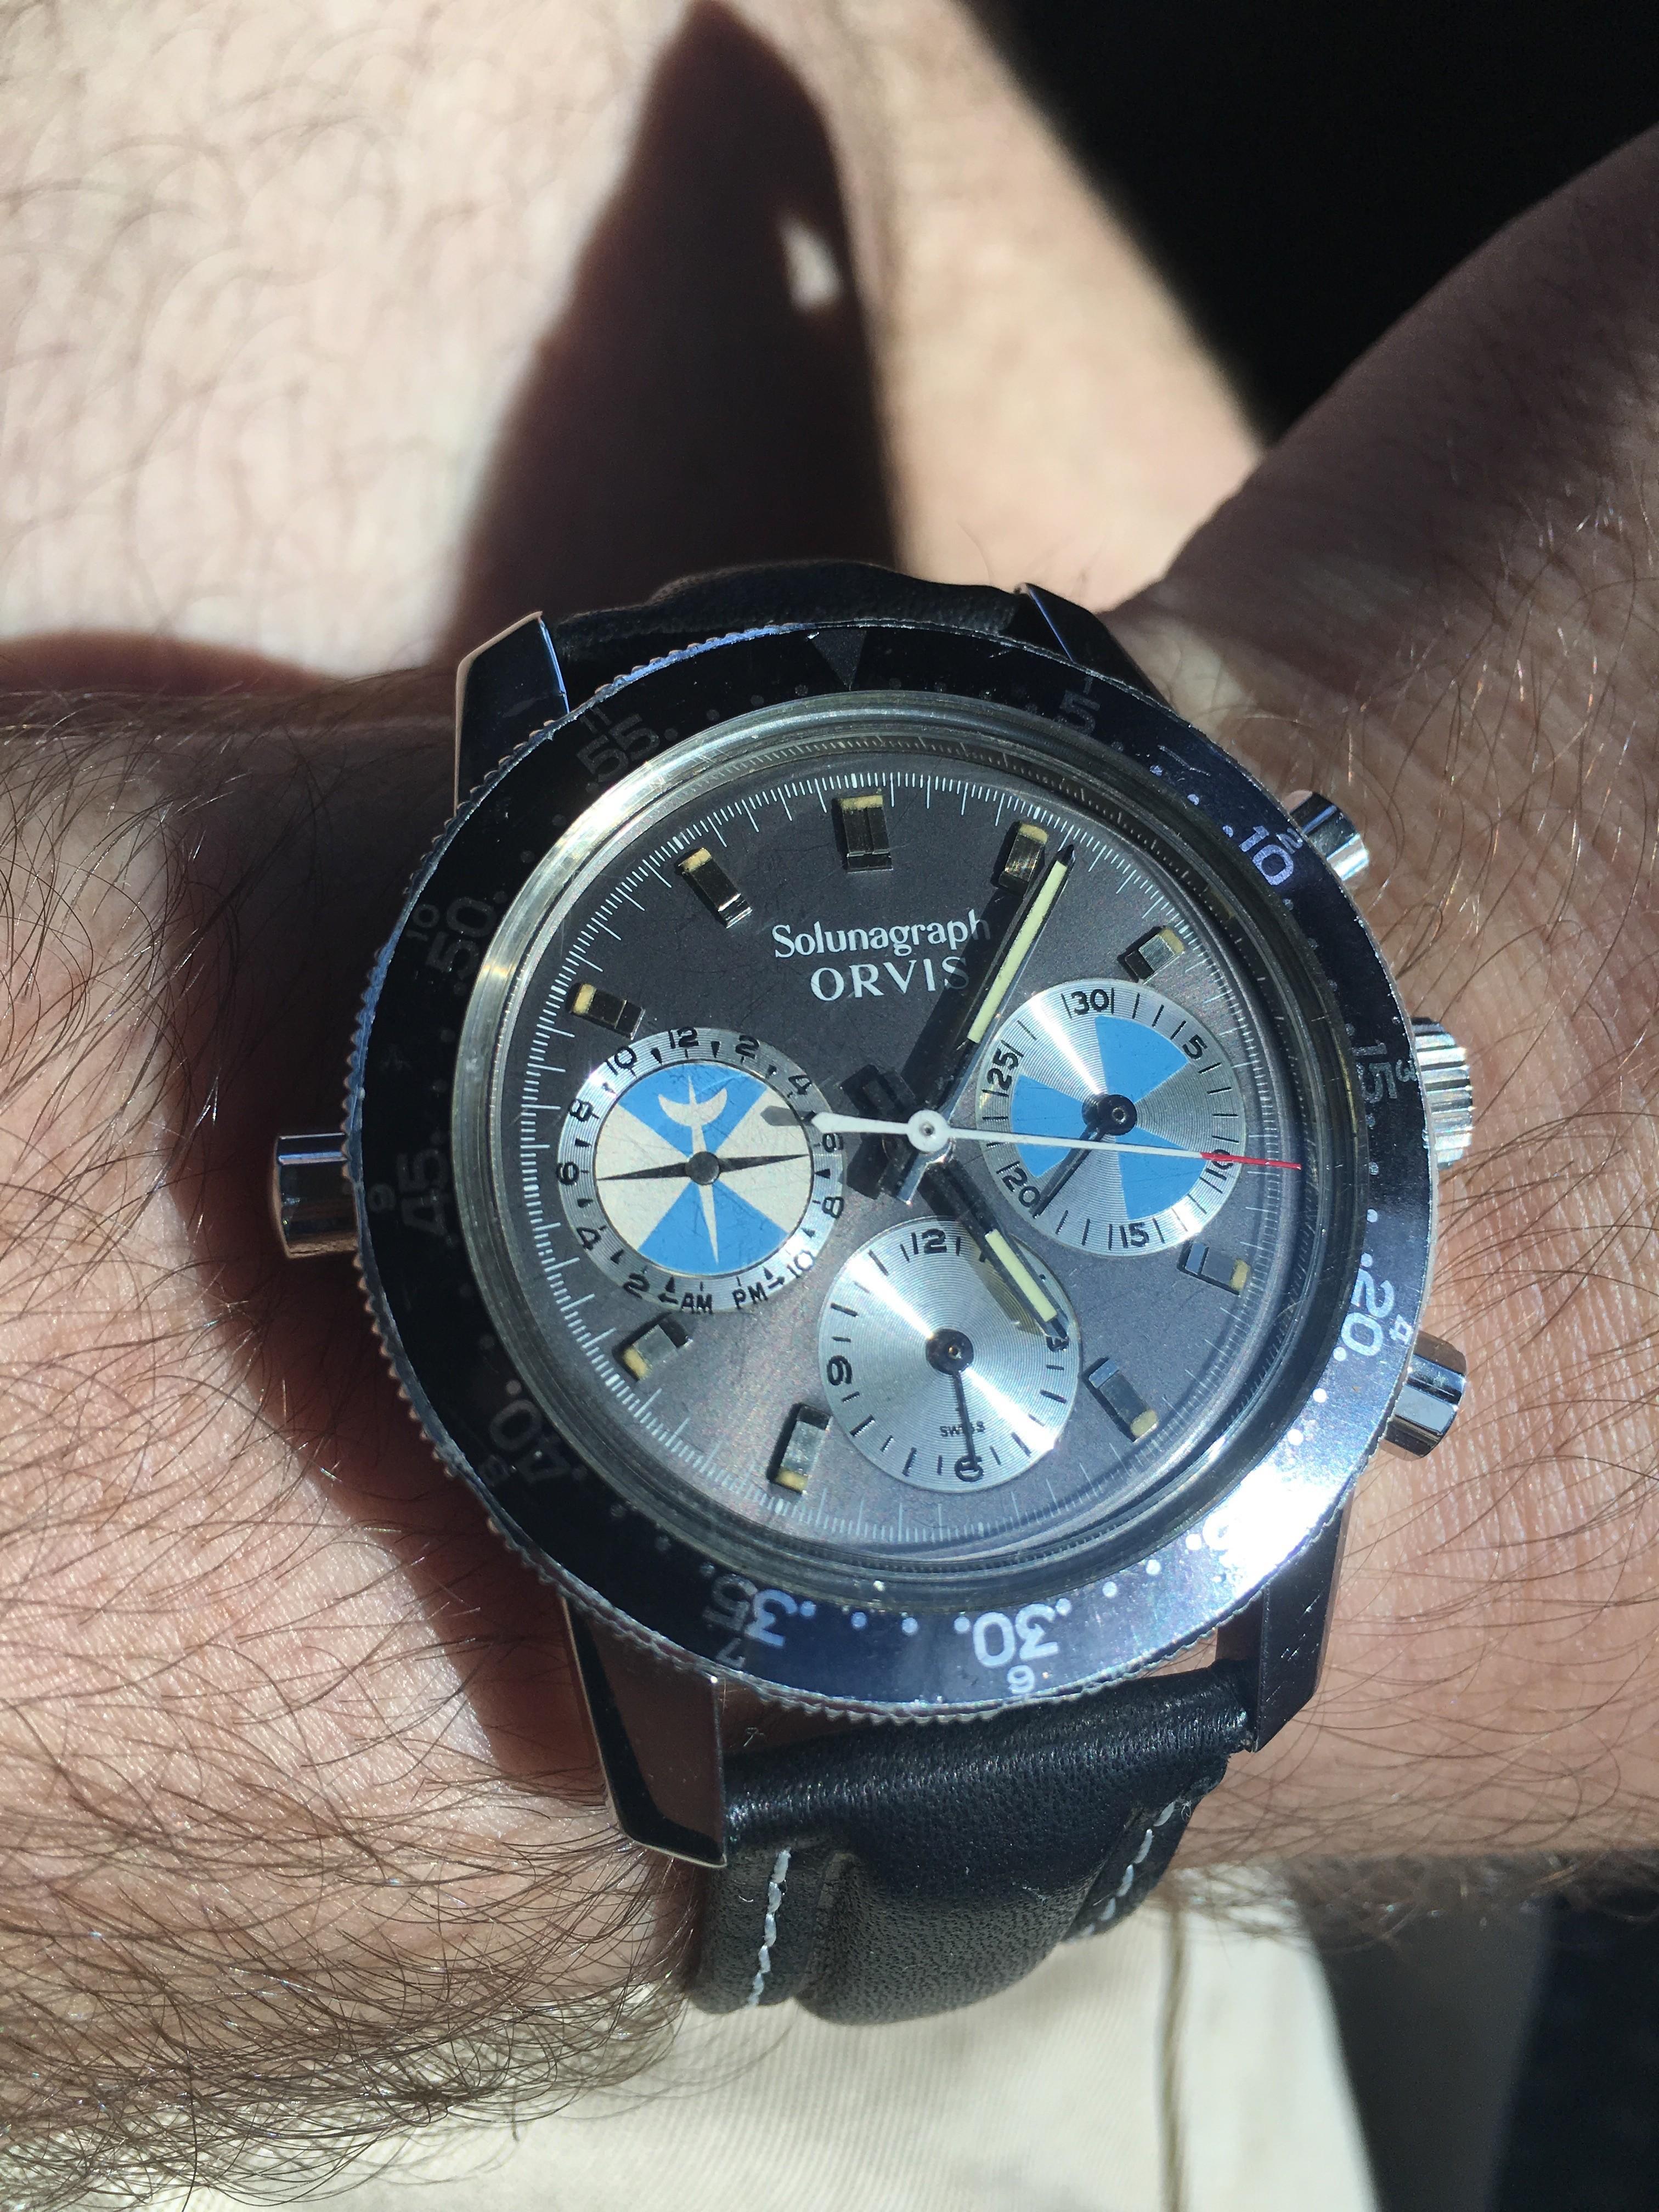 PartagasIV's photos in The Watch Appreciation Thread - Part Three